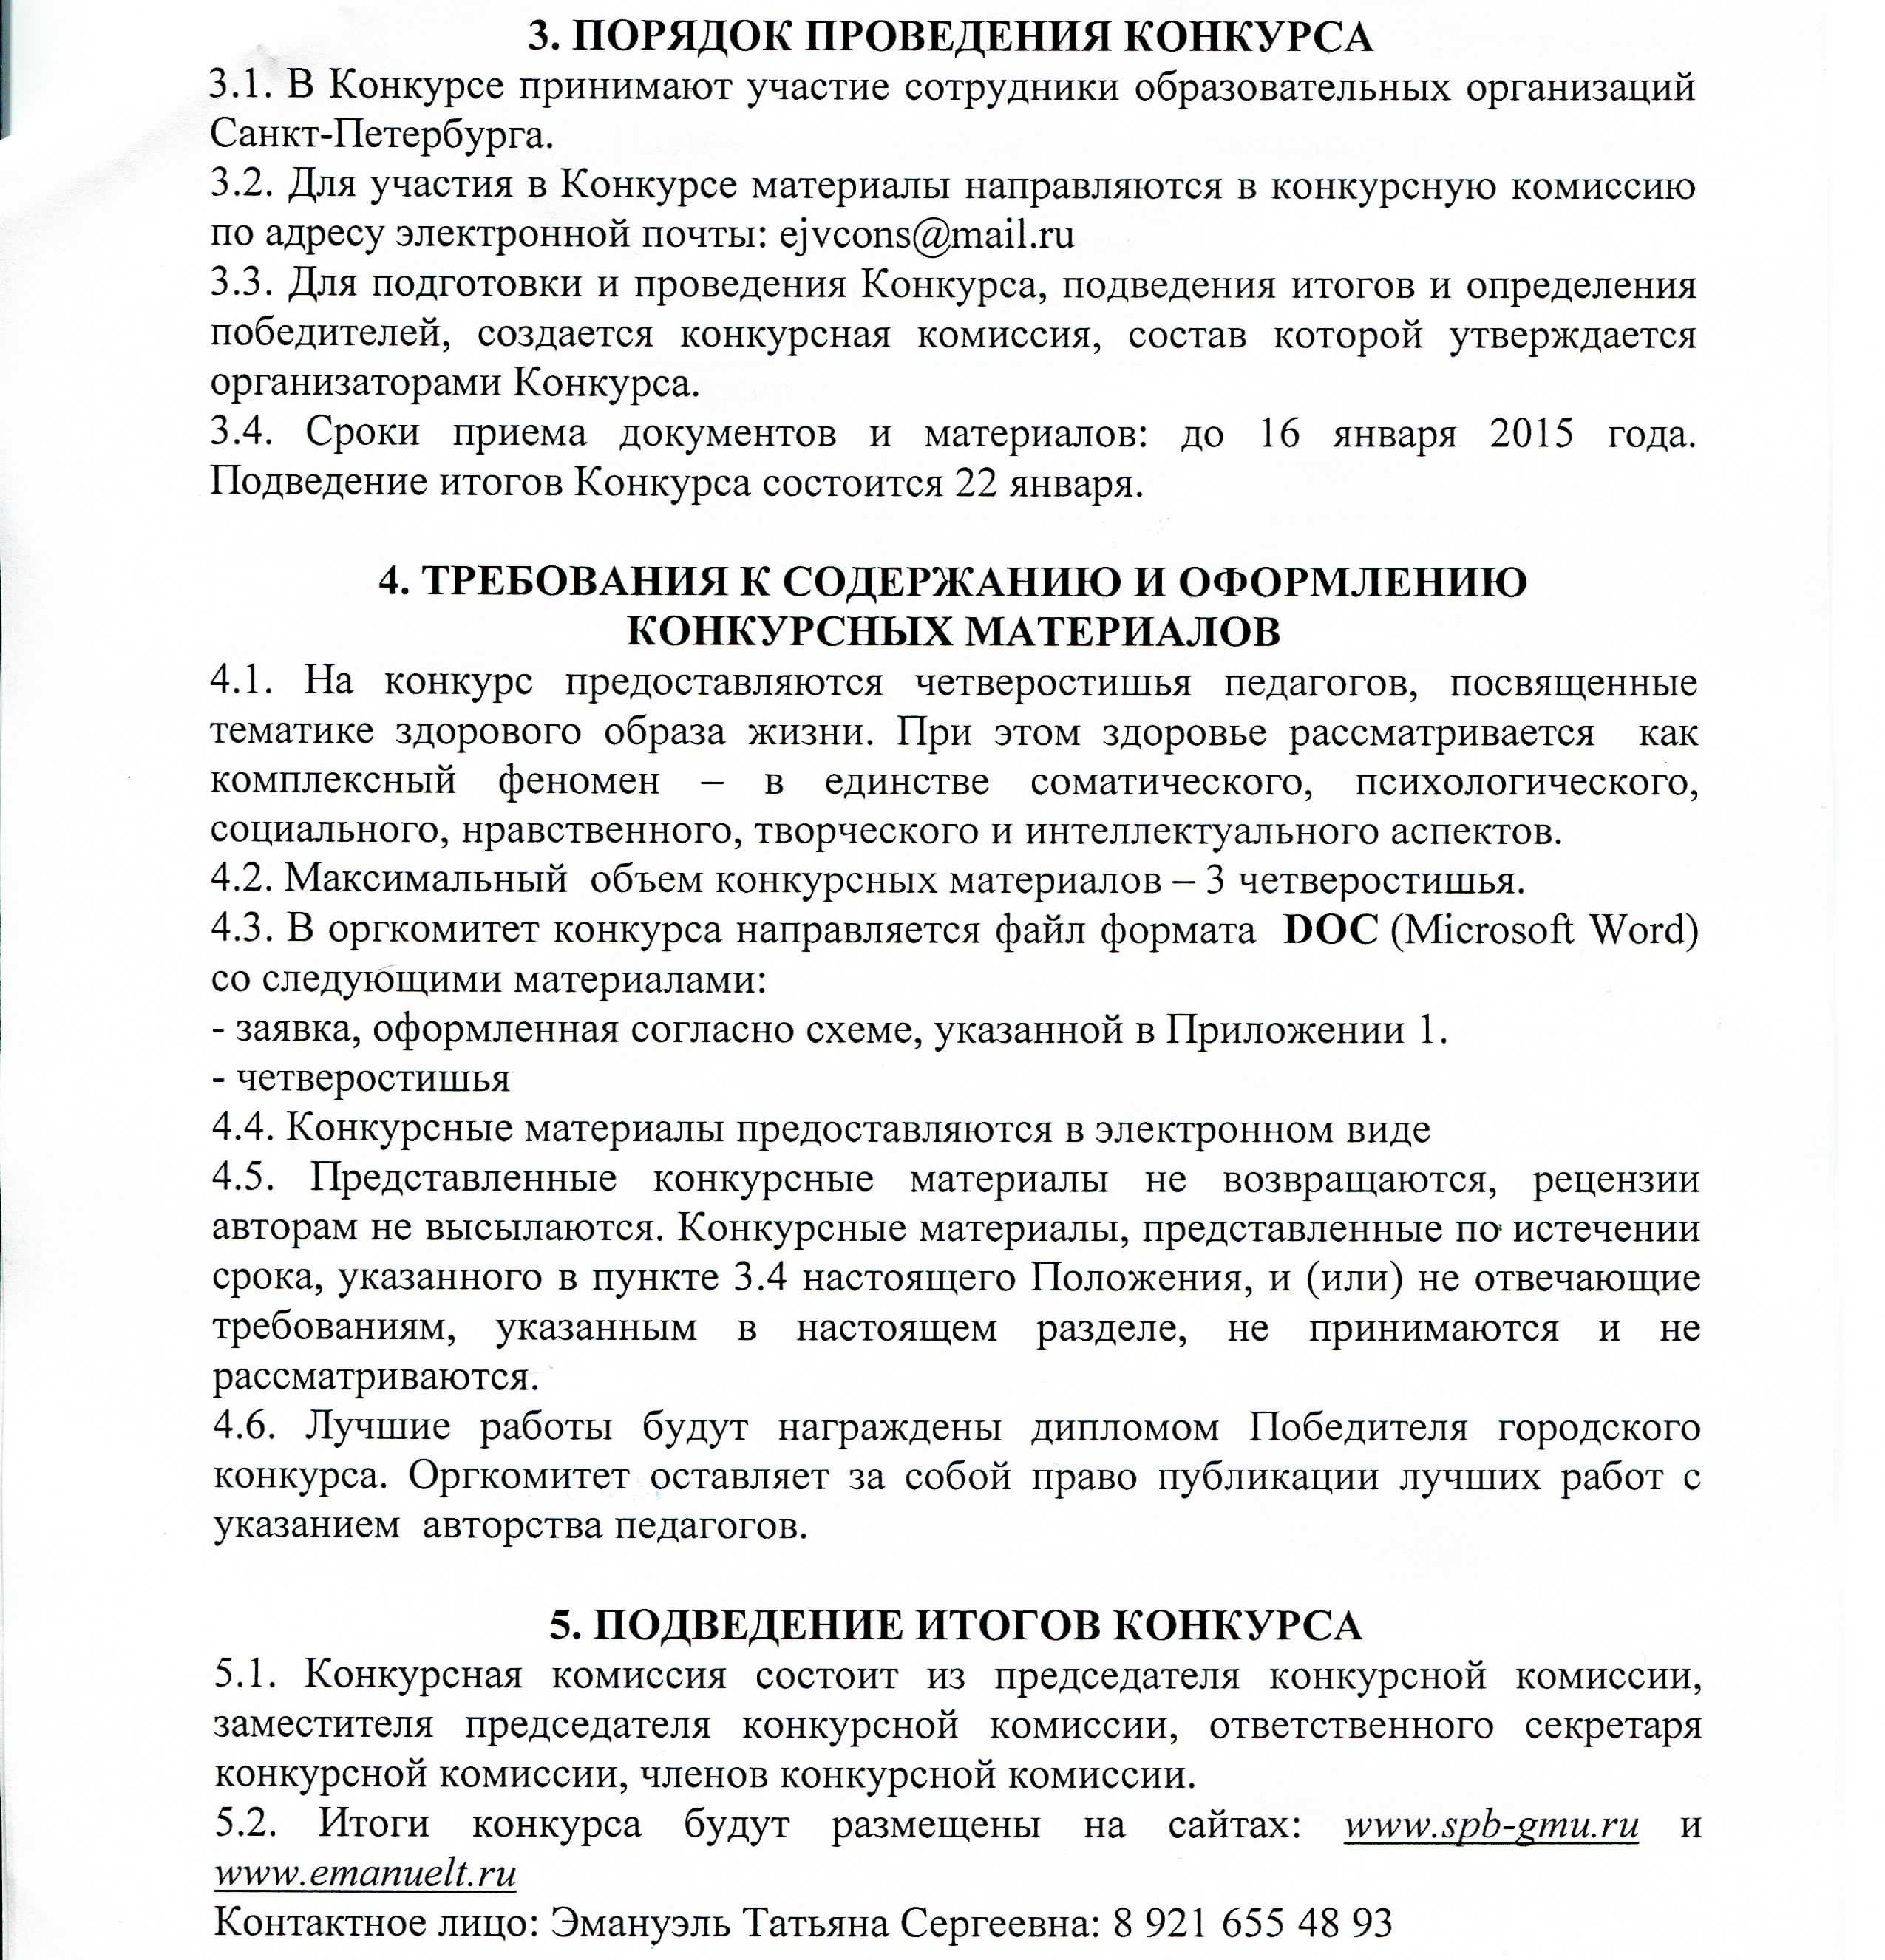 konk ped tvor_Страница_2